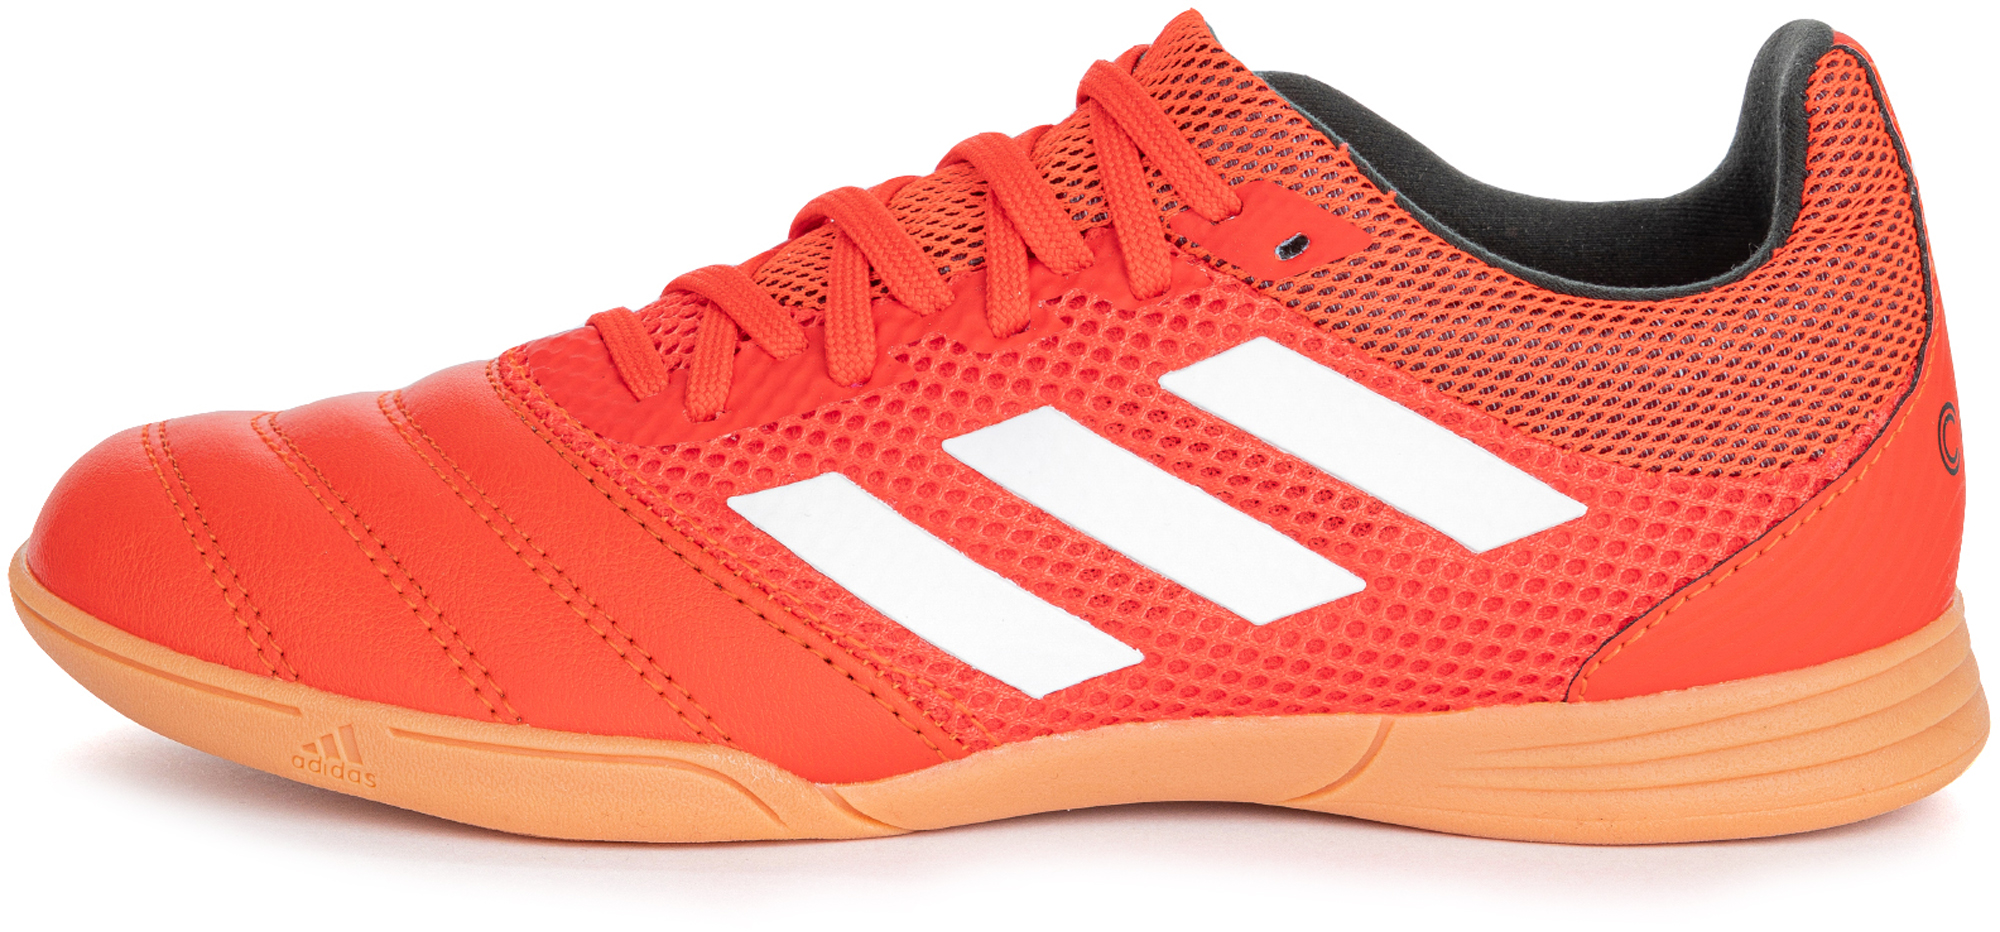 Adidas Бутсы для мальчиков Copa 20.3 In Sala, размер 35